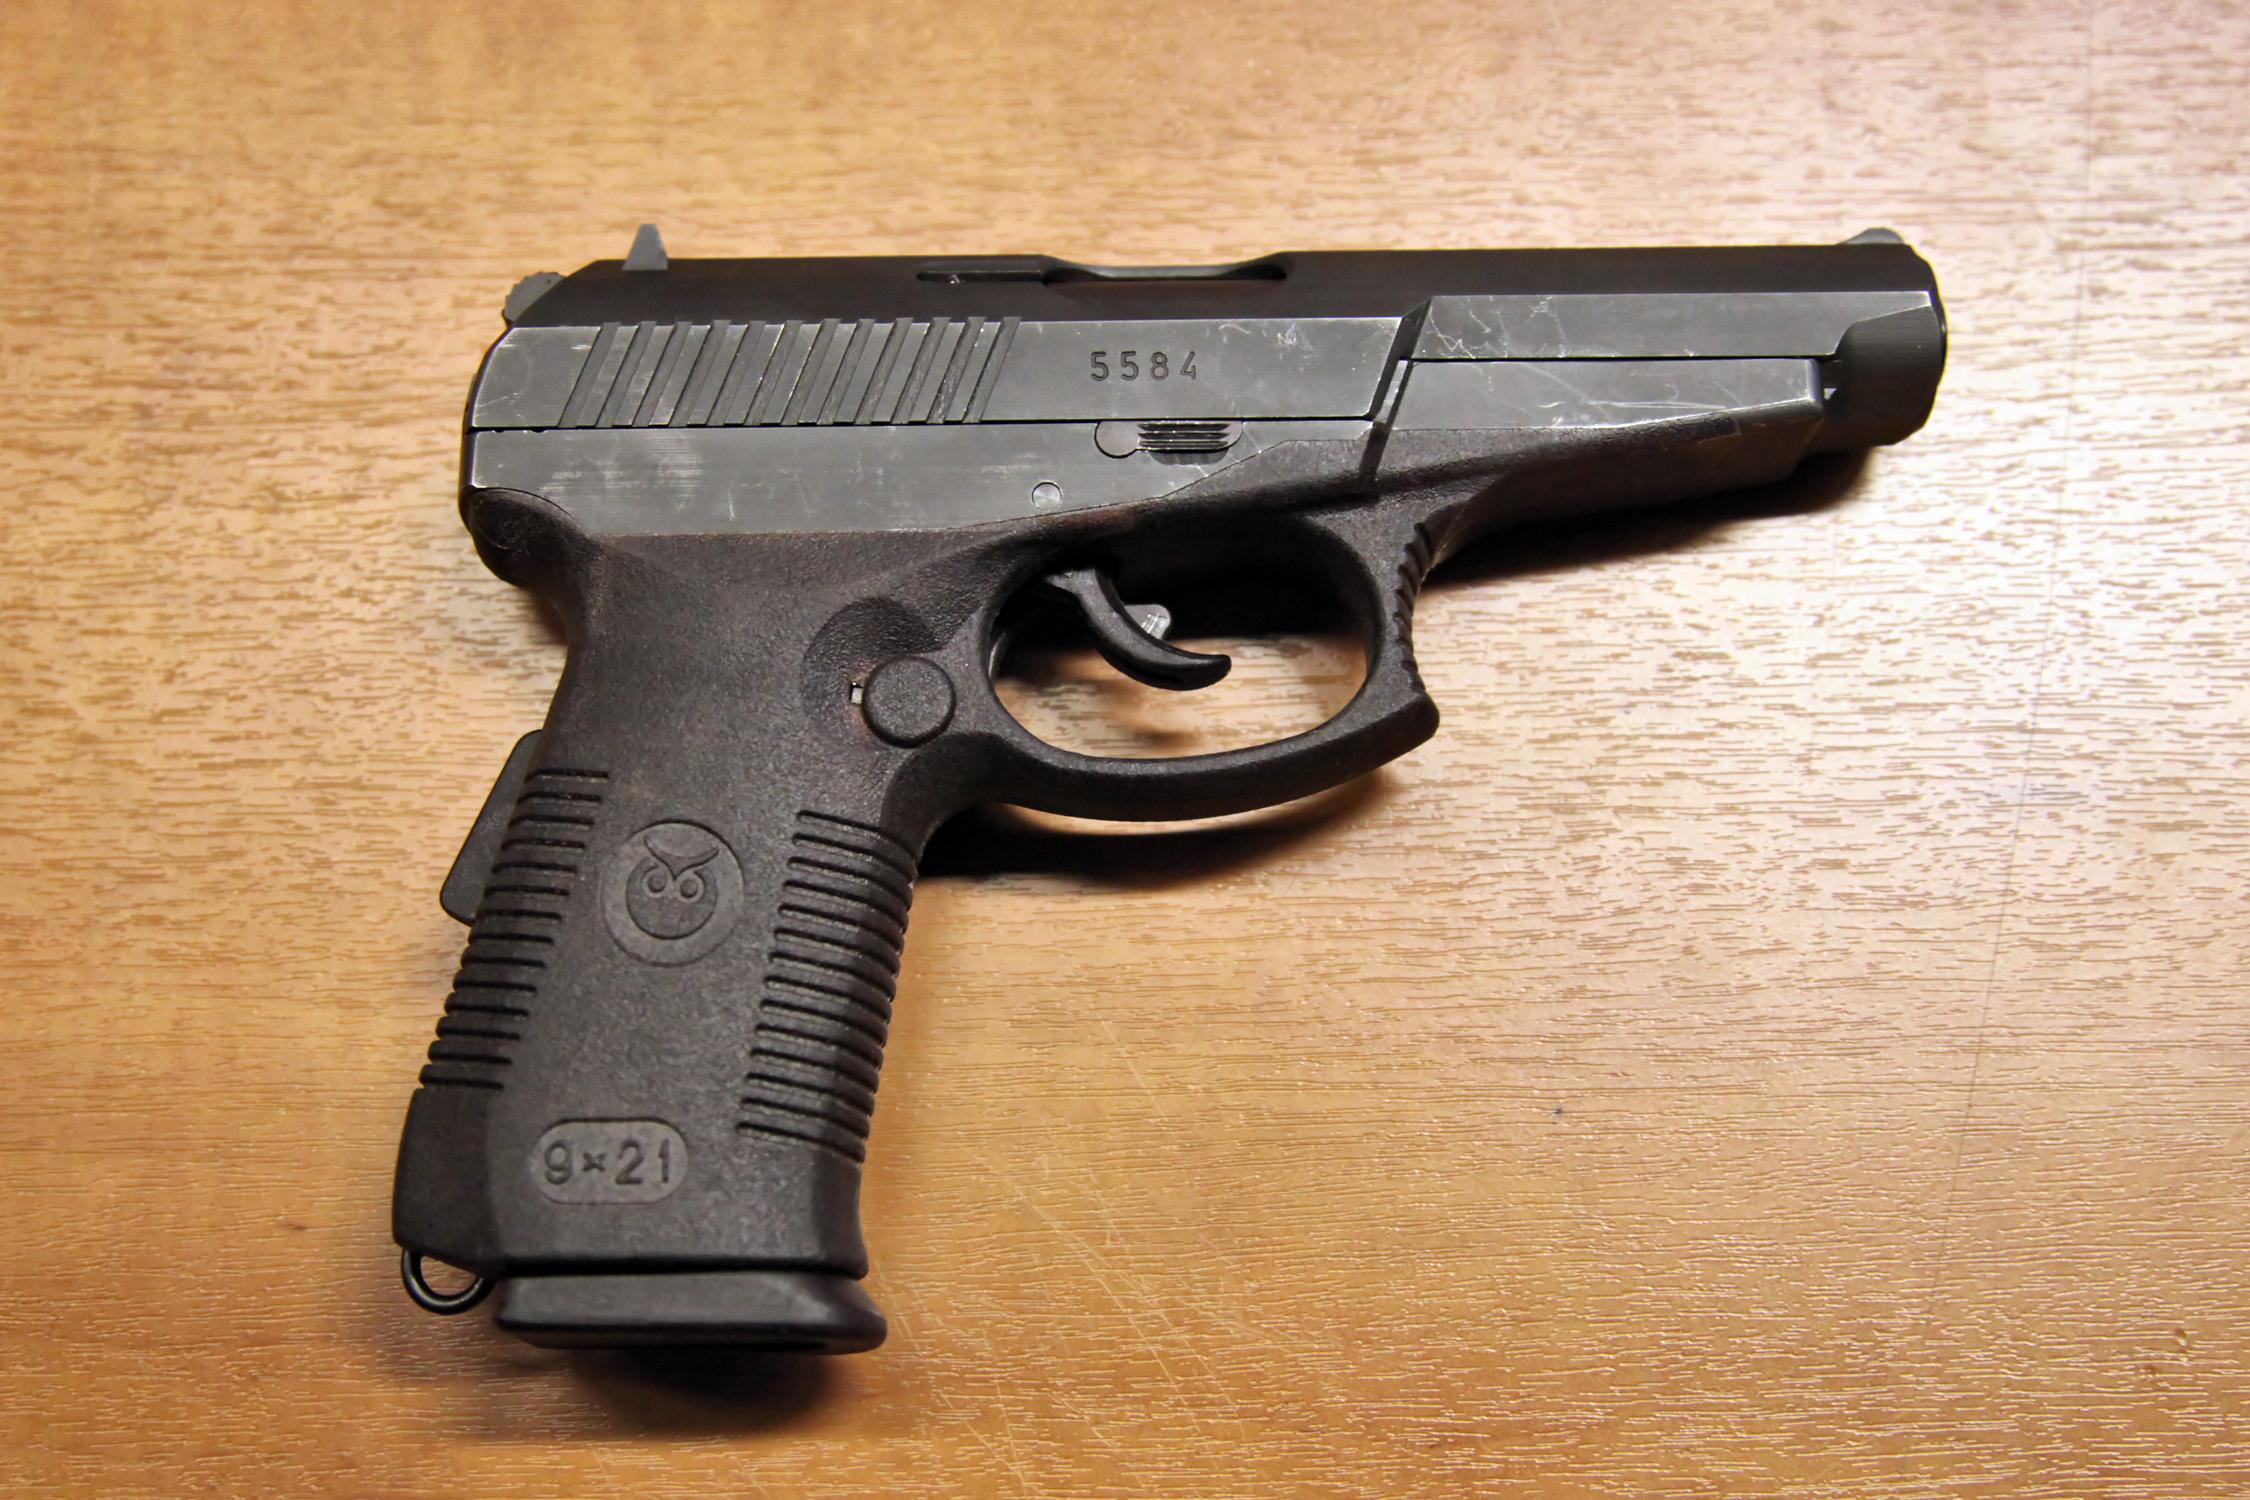 Russia's SR-1MP handgun